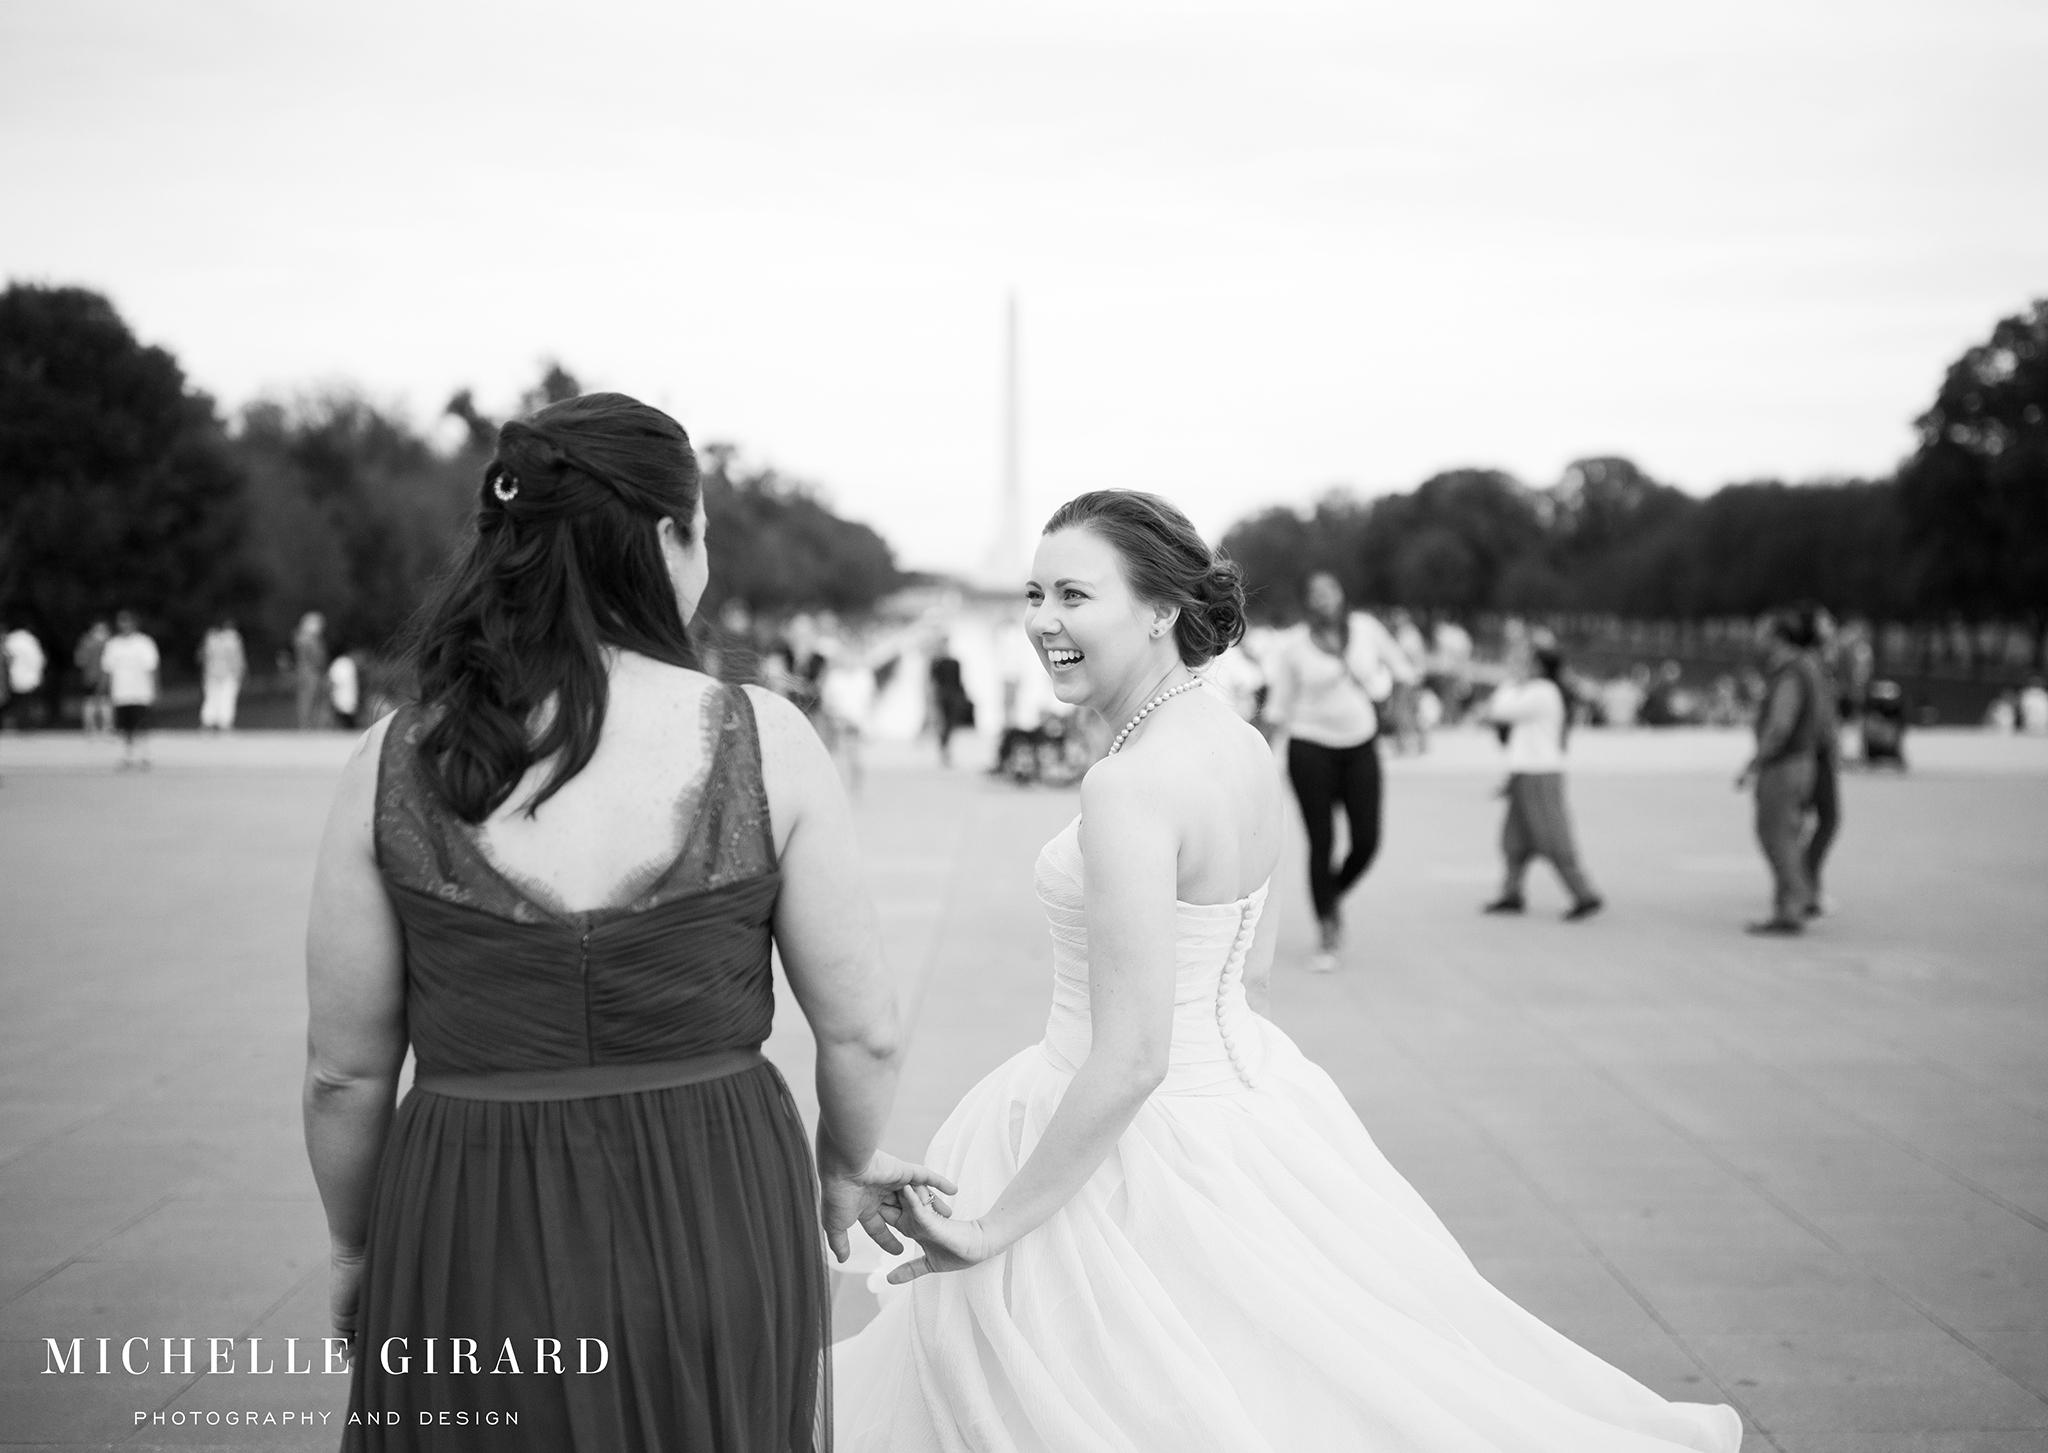 WashingtonDCFallWedding_LincolnMemorial_DestinationCityWedding_MichelleGirardPhotography10.jpg